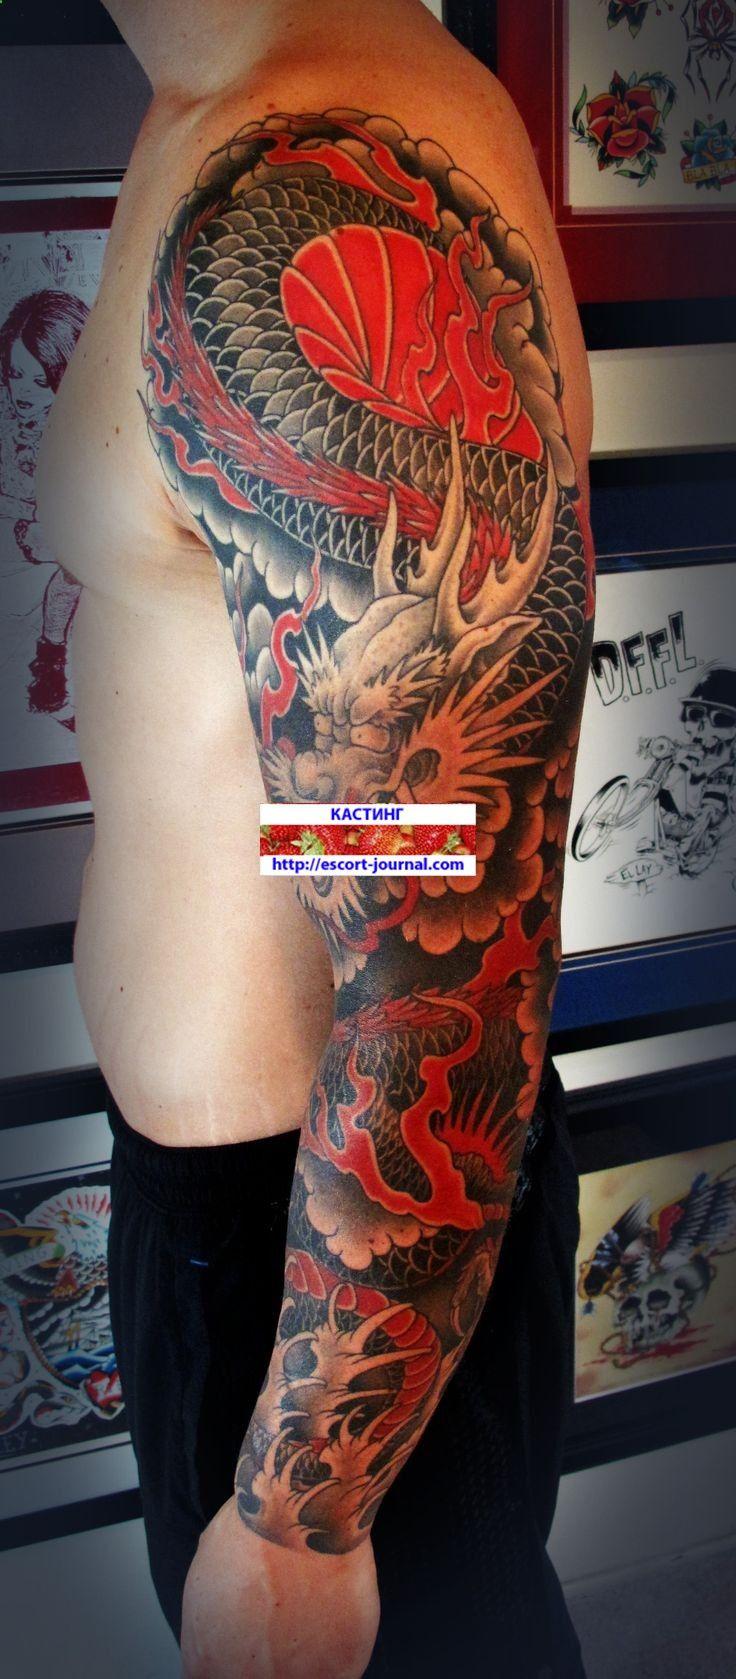 181 best Tattoos images on Pinterest   Tattoo ideas, Tattoo designs ...